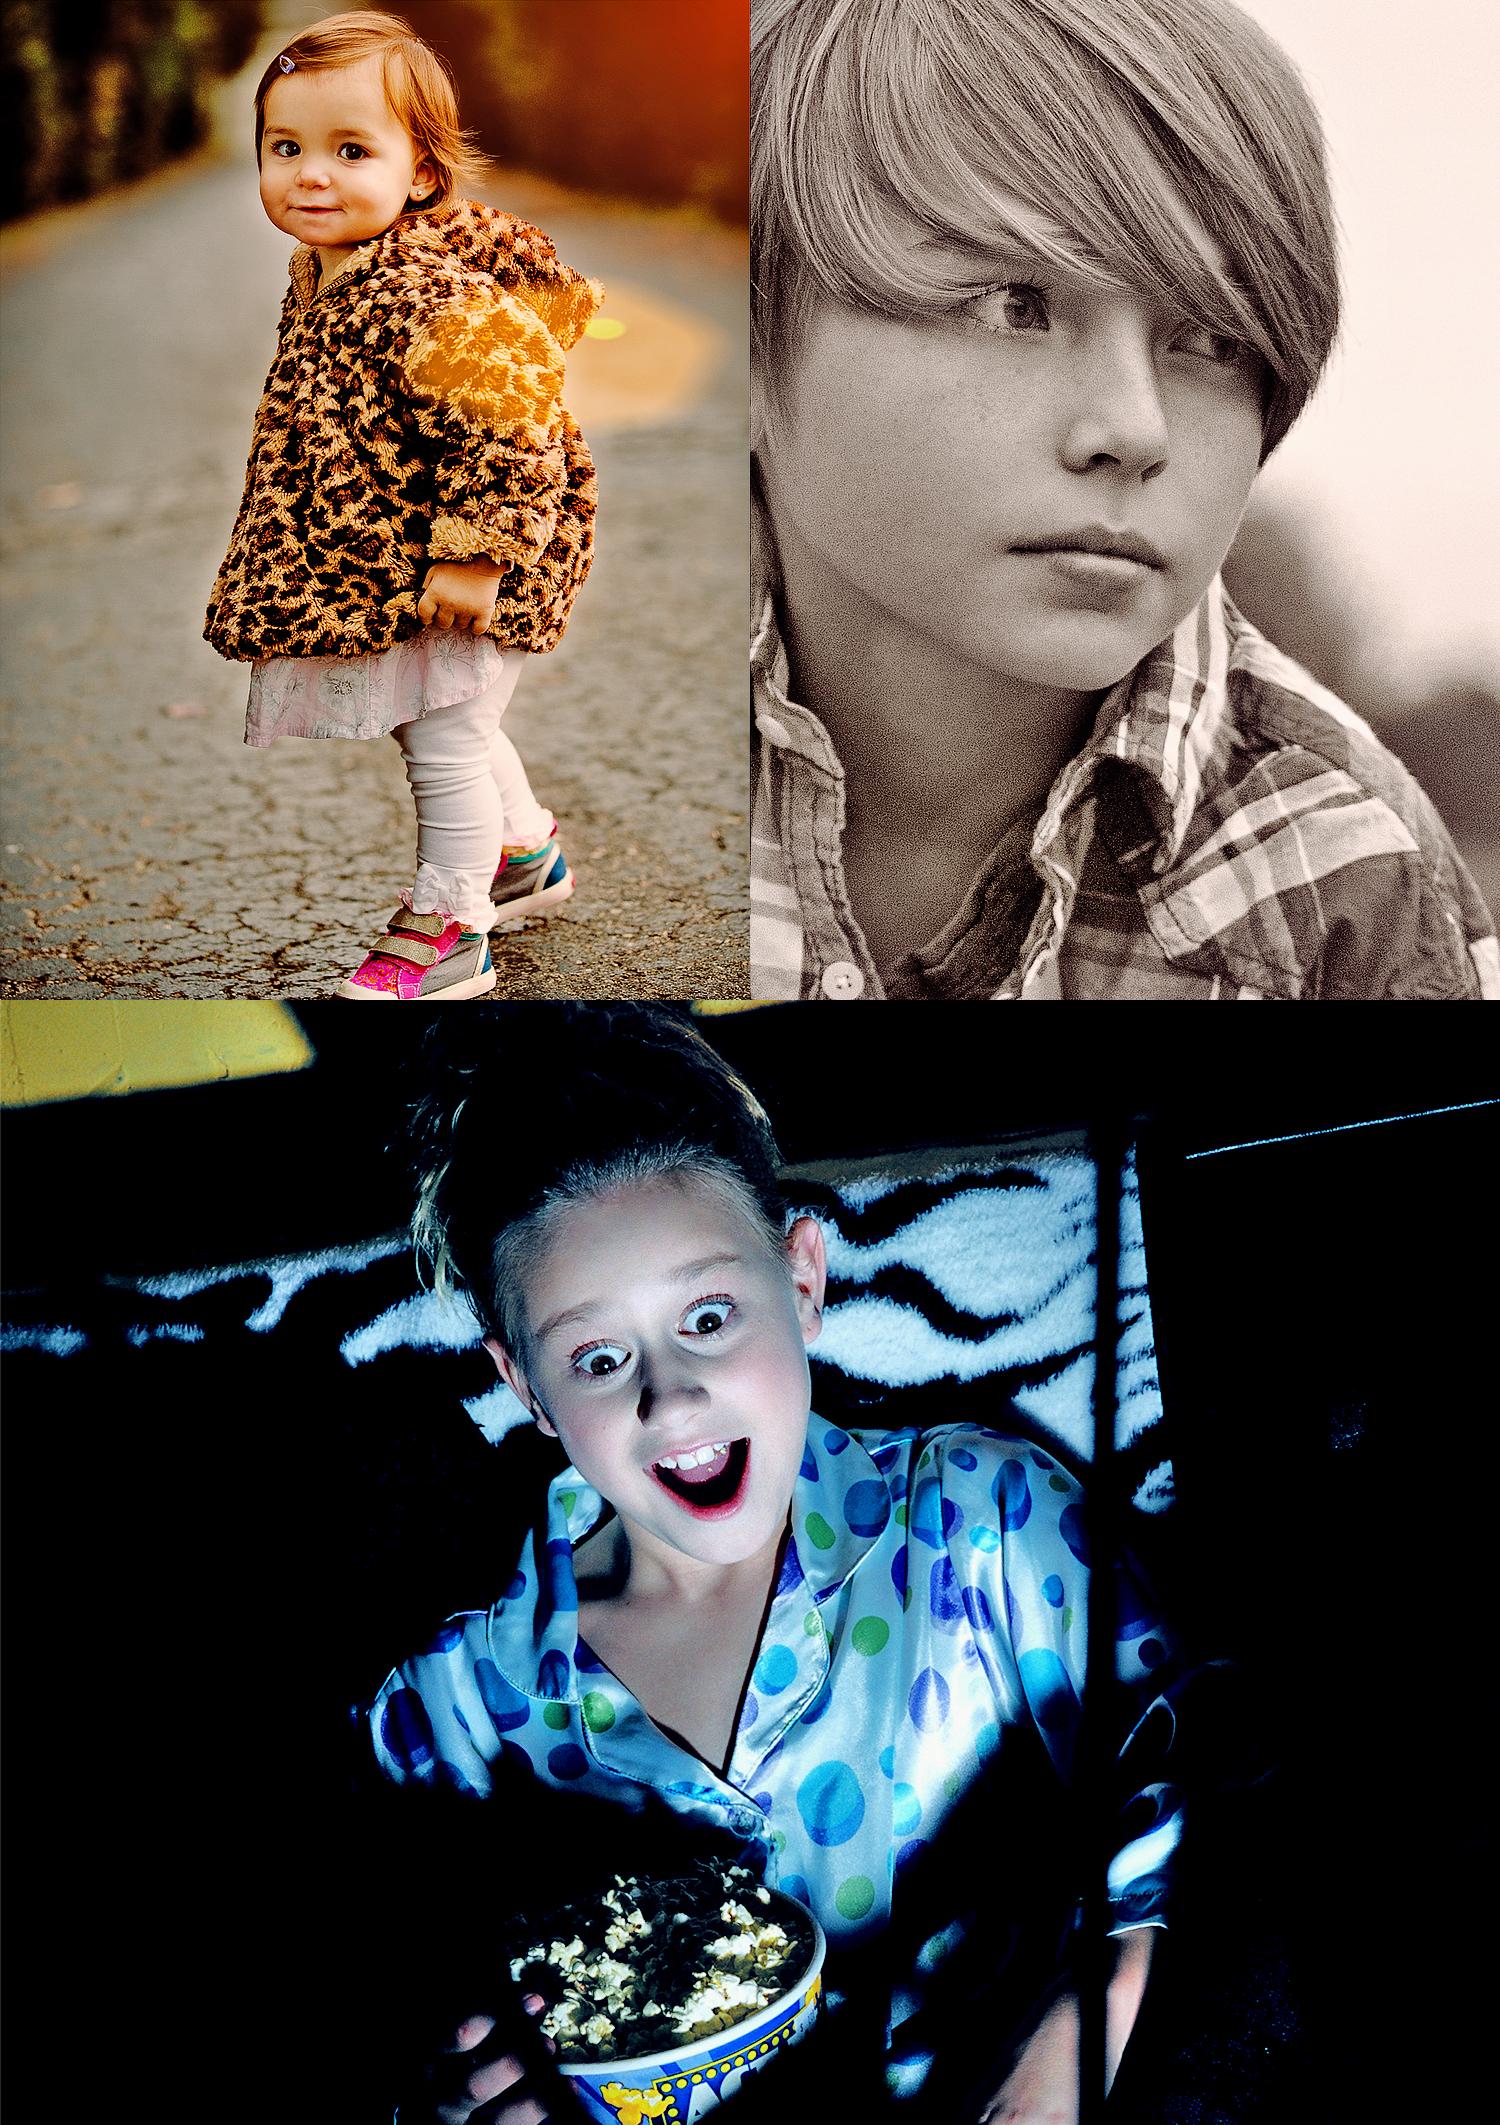 jun-pino-children-kid-modeling-photographer 2.jpg